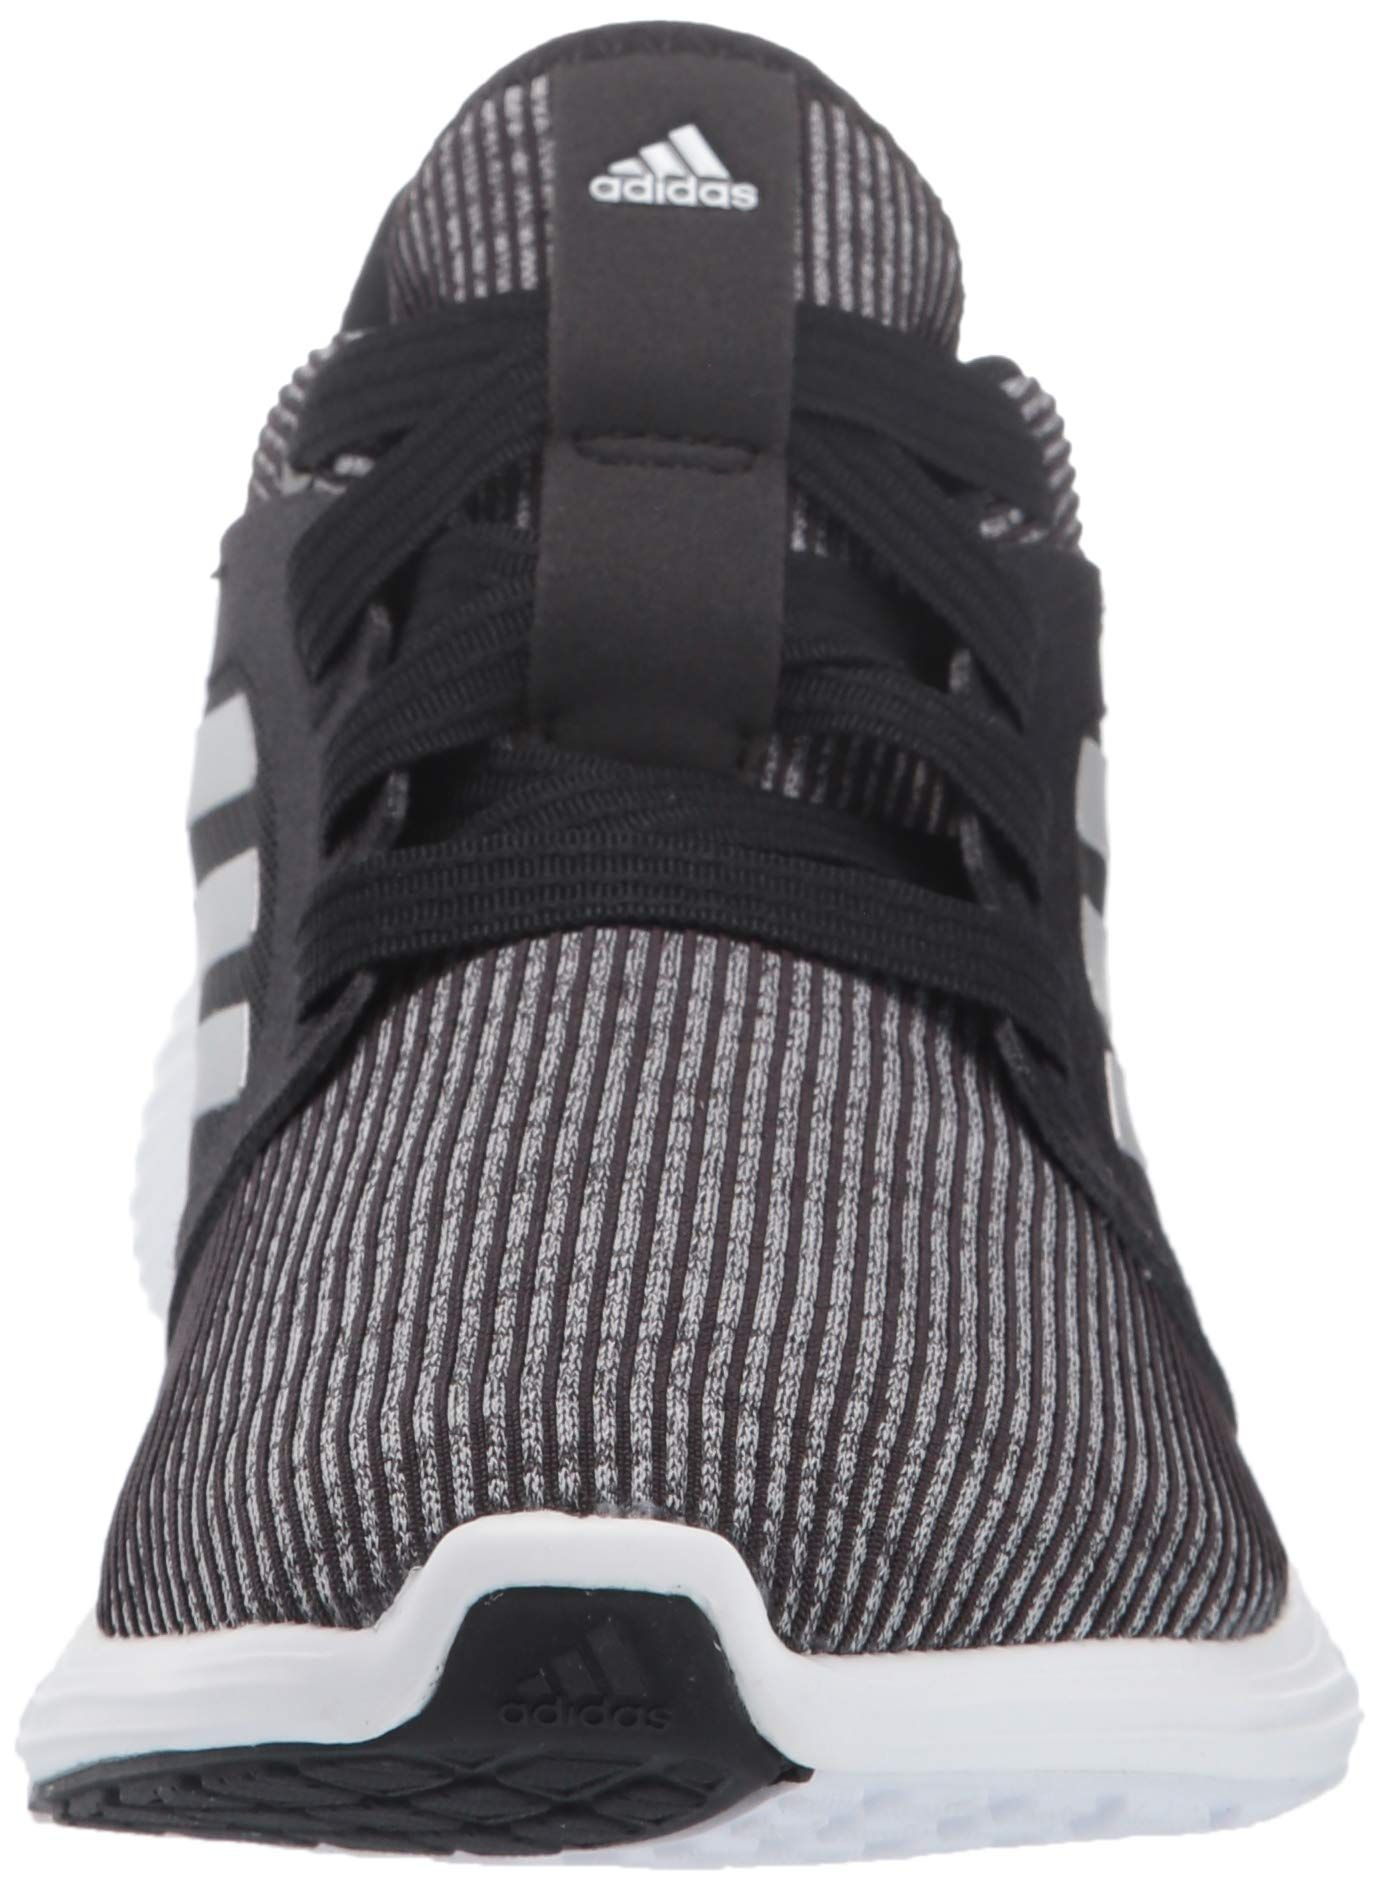 390b806009b adidas Womens Edge Lux 3 Silver Metallic Black 8 M US   Want to know ...